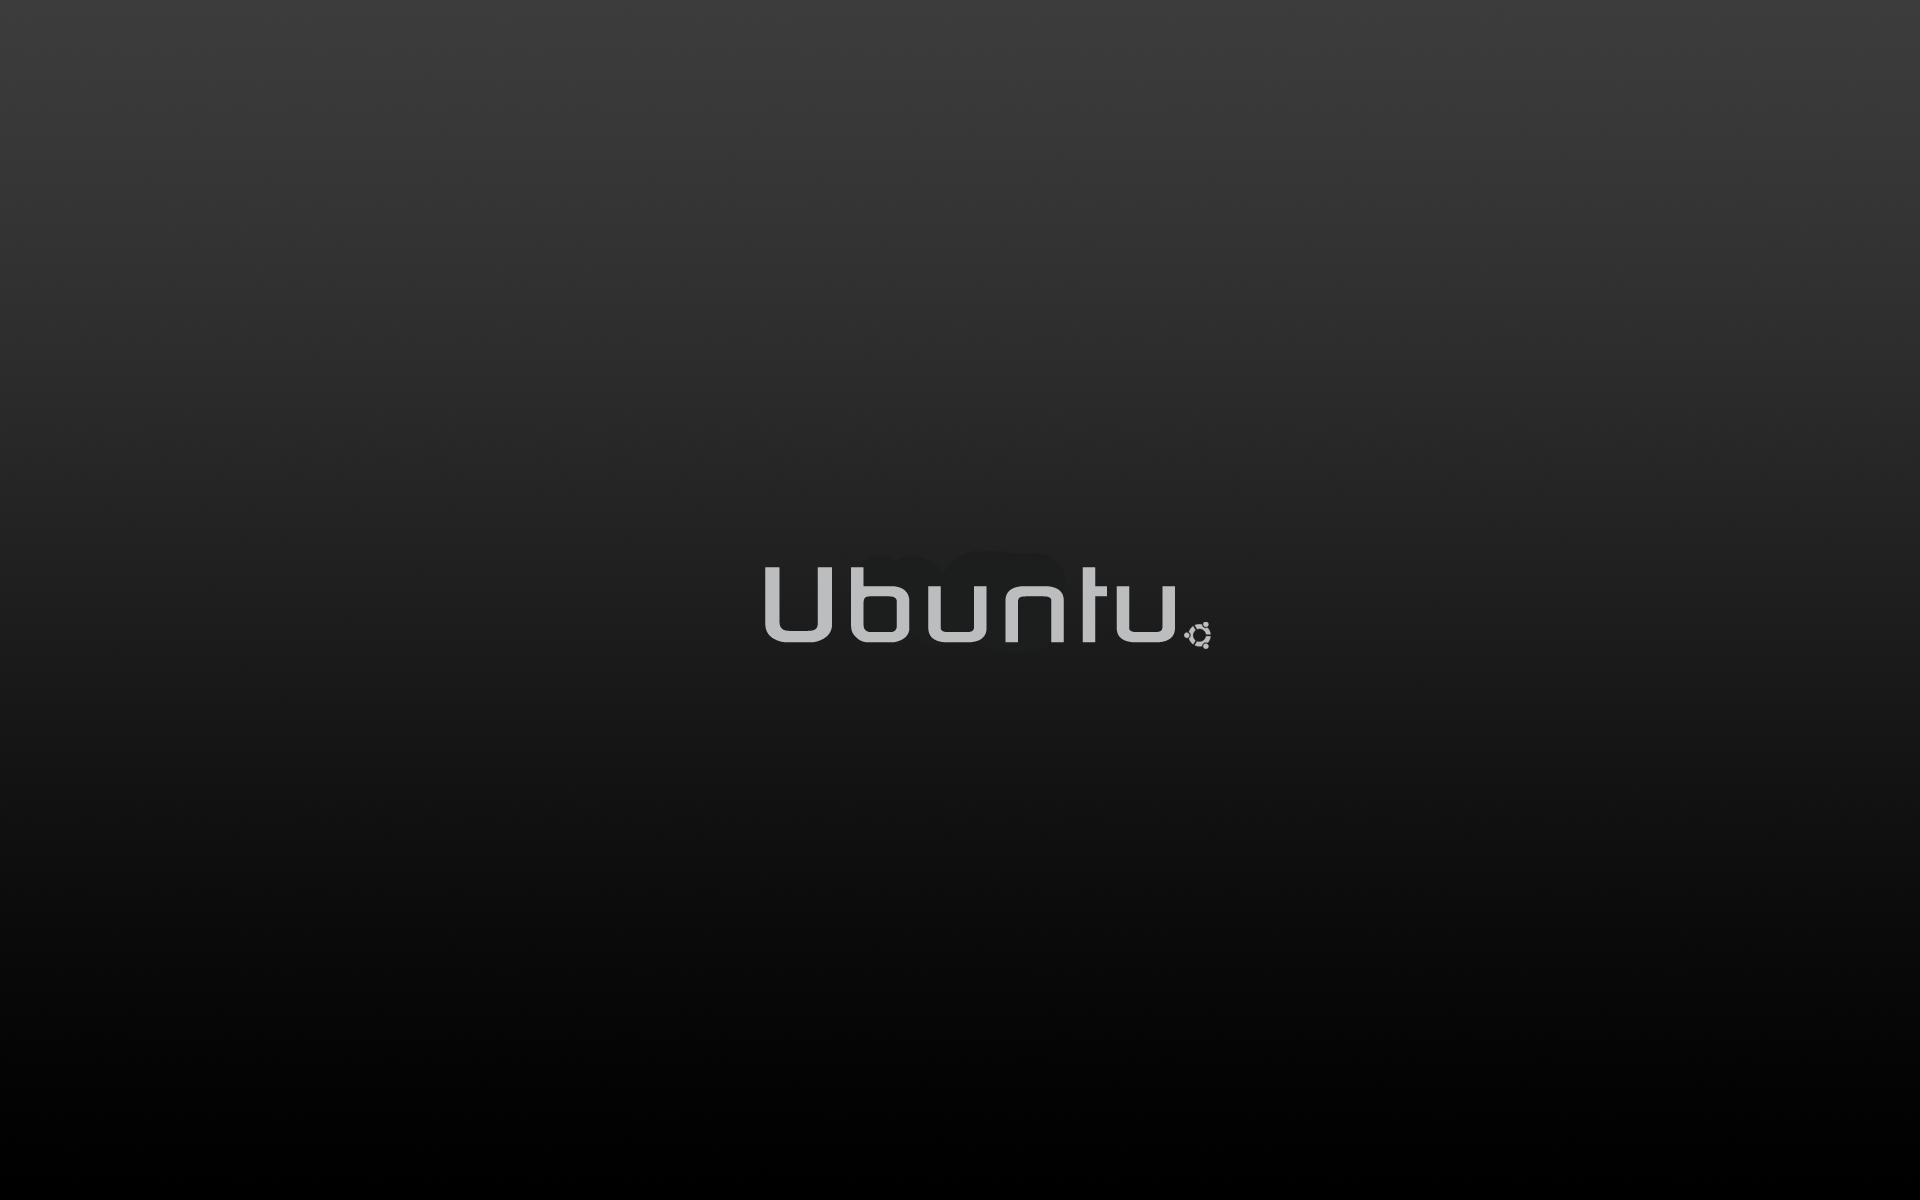 Ubuntu Dark wallpaper 9310 1920x1200